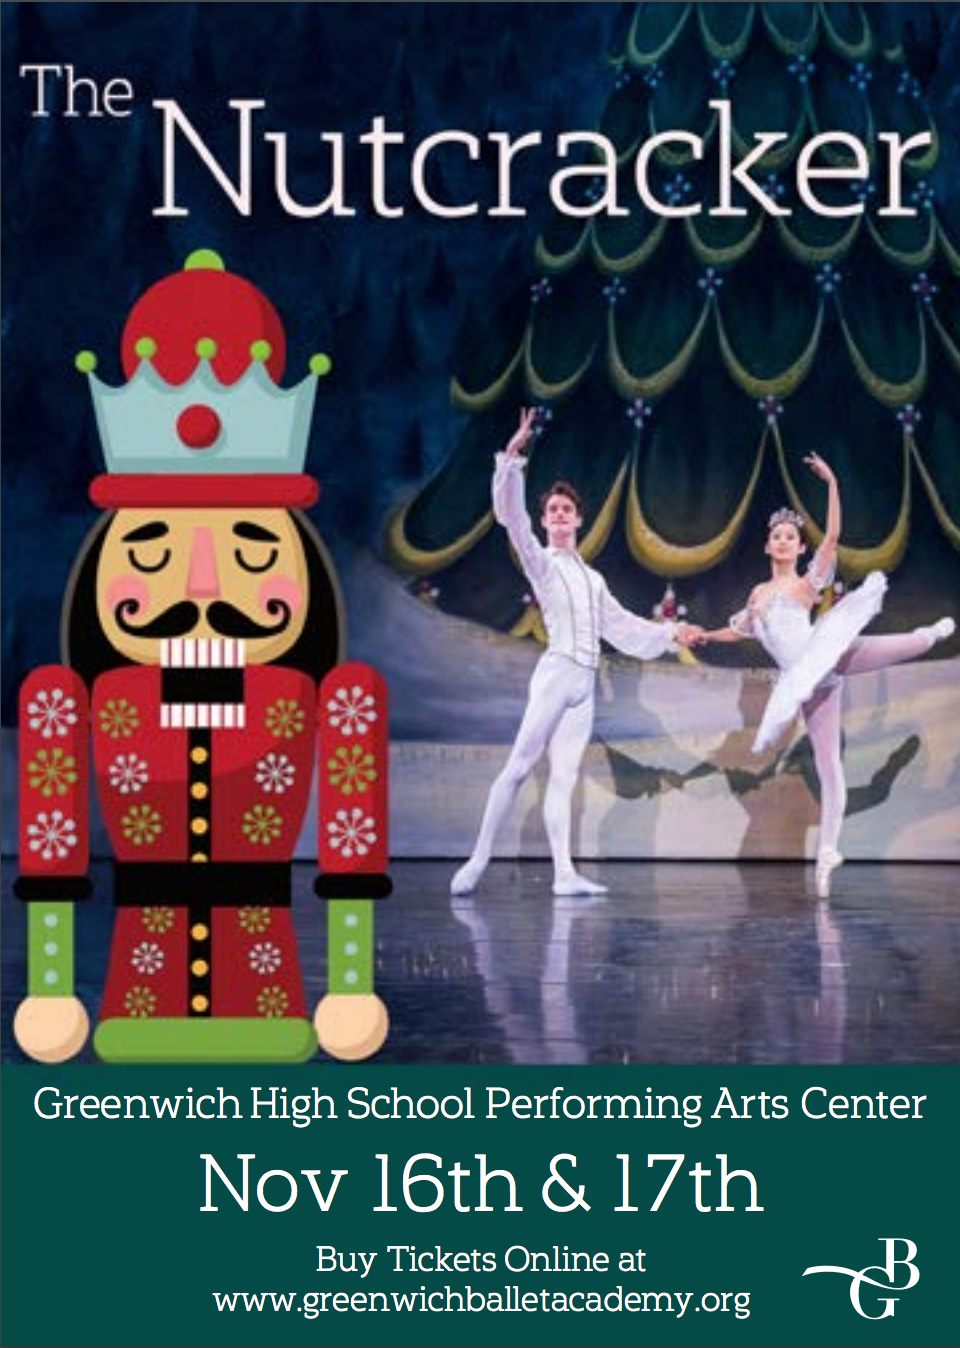 The Nutcracker @ Greenwich High School Performing Arts Center  @ 10 Hillside Road, Greenwich, Connecticut, 06830, United States